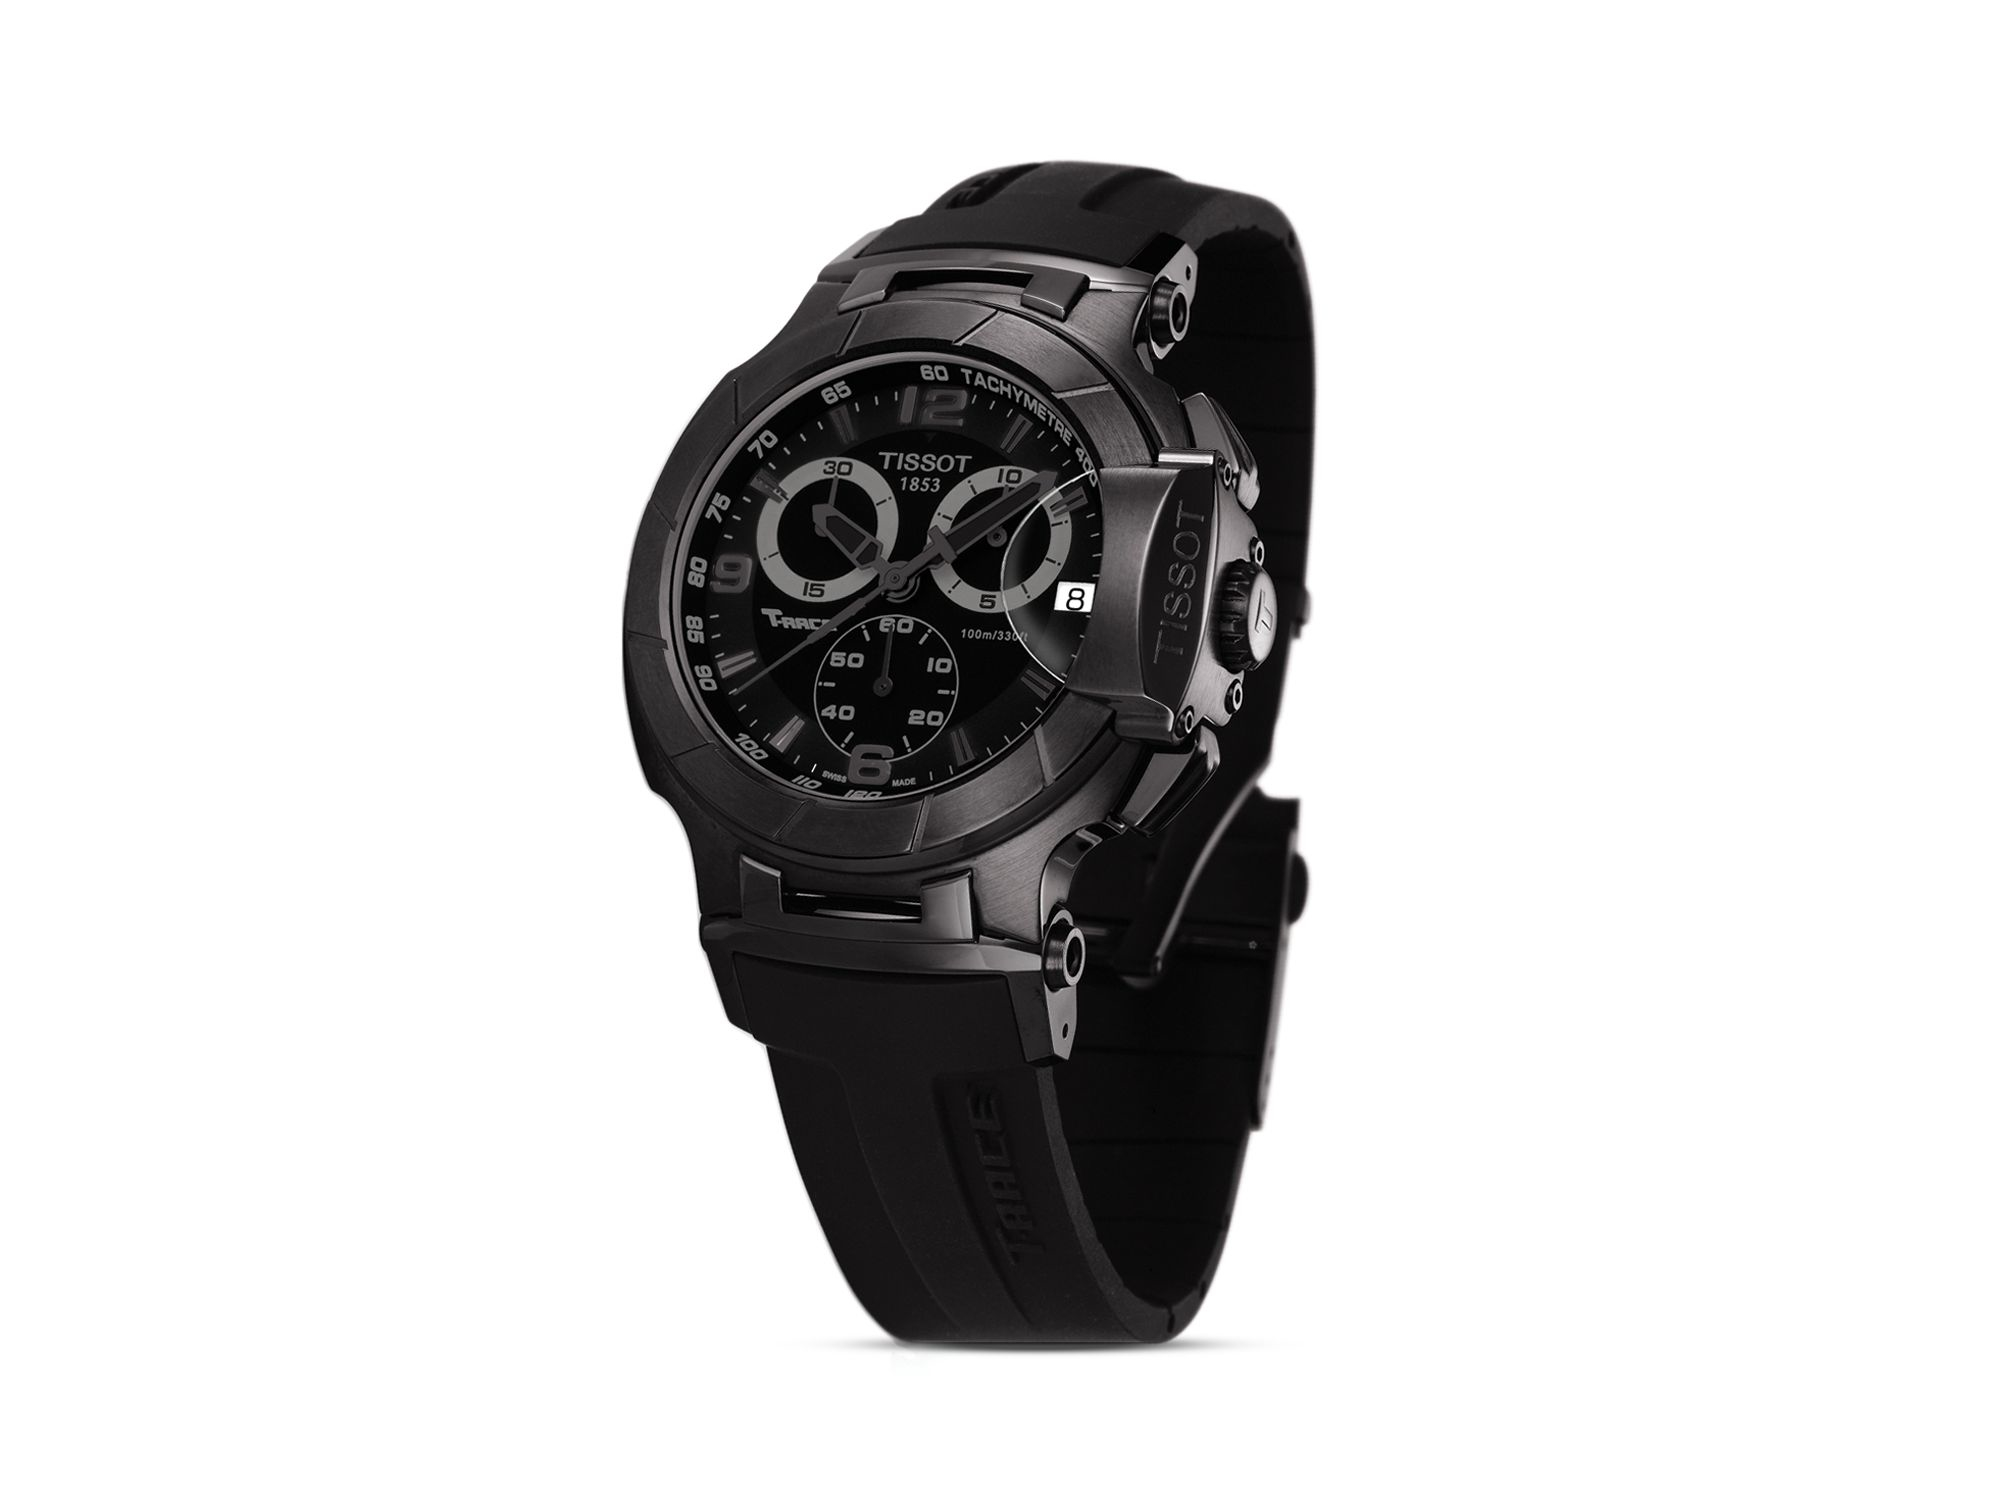 8997f4b331b Tissot T-race Men's Black Quartz Chronograph Sport Watch, 50mm in ...